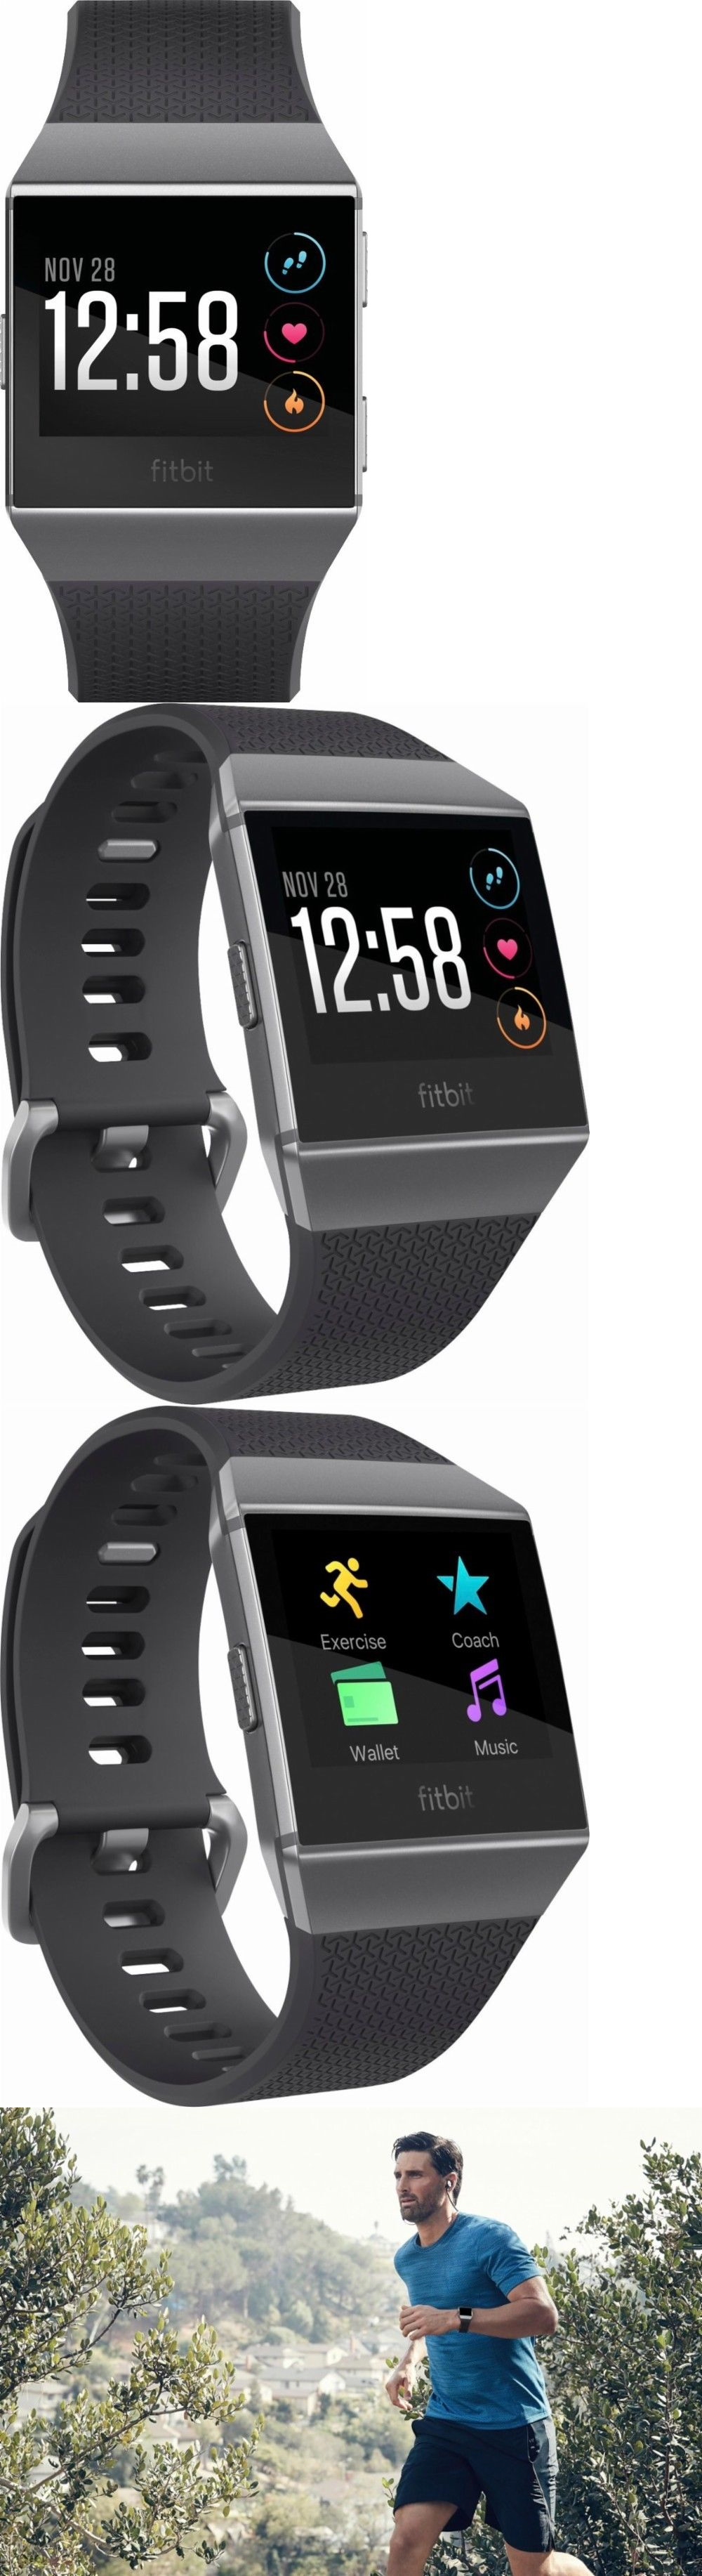 Pedometers 44077 Fitbit Ionic Smartwatch Charcoal Black Smoke Gray Brand New Sealed